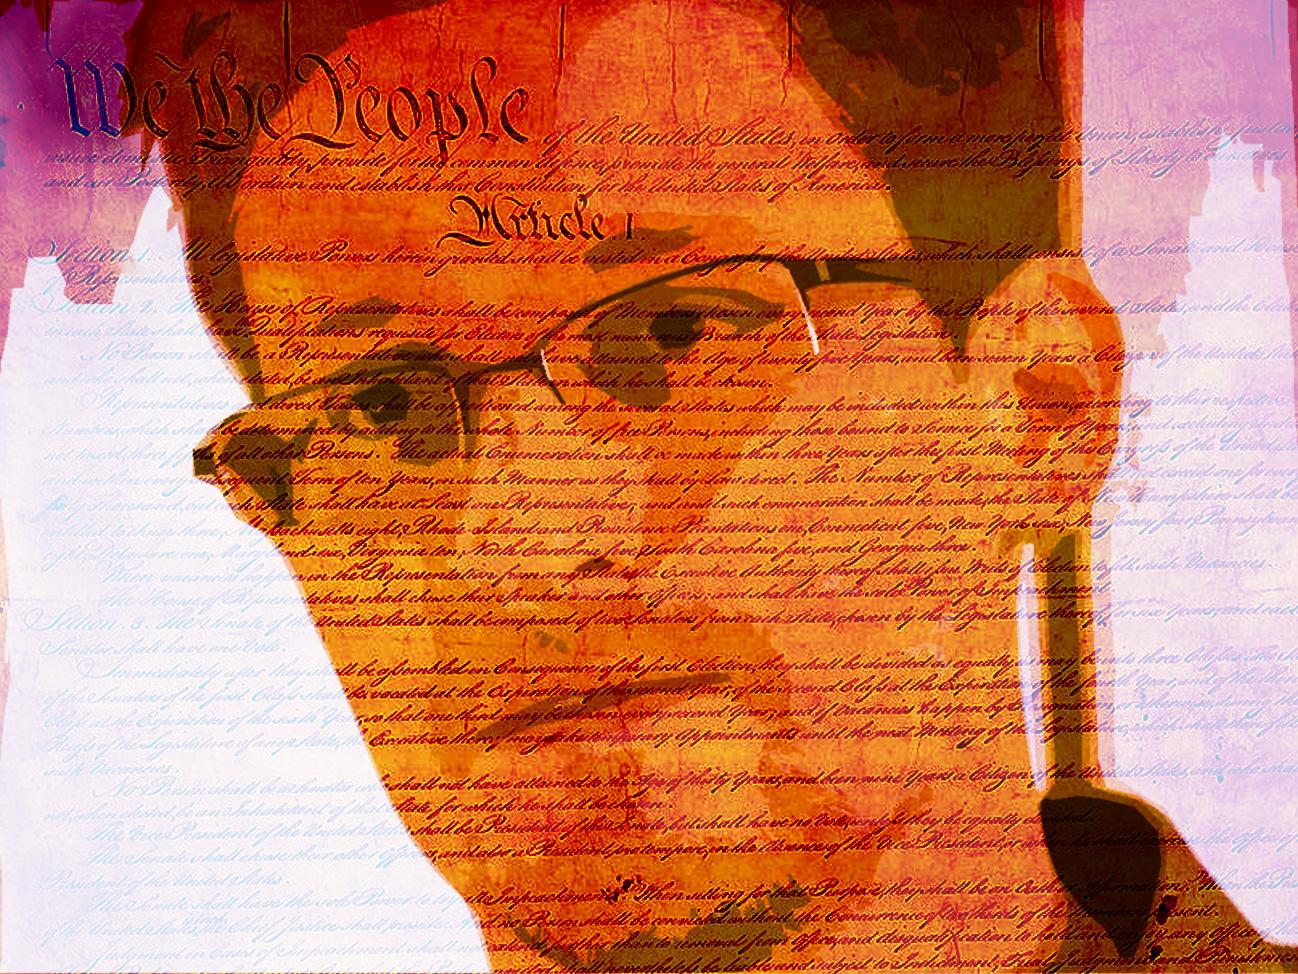 Will Trump pardon Edward Snowden?